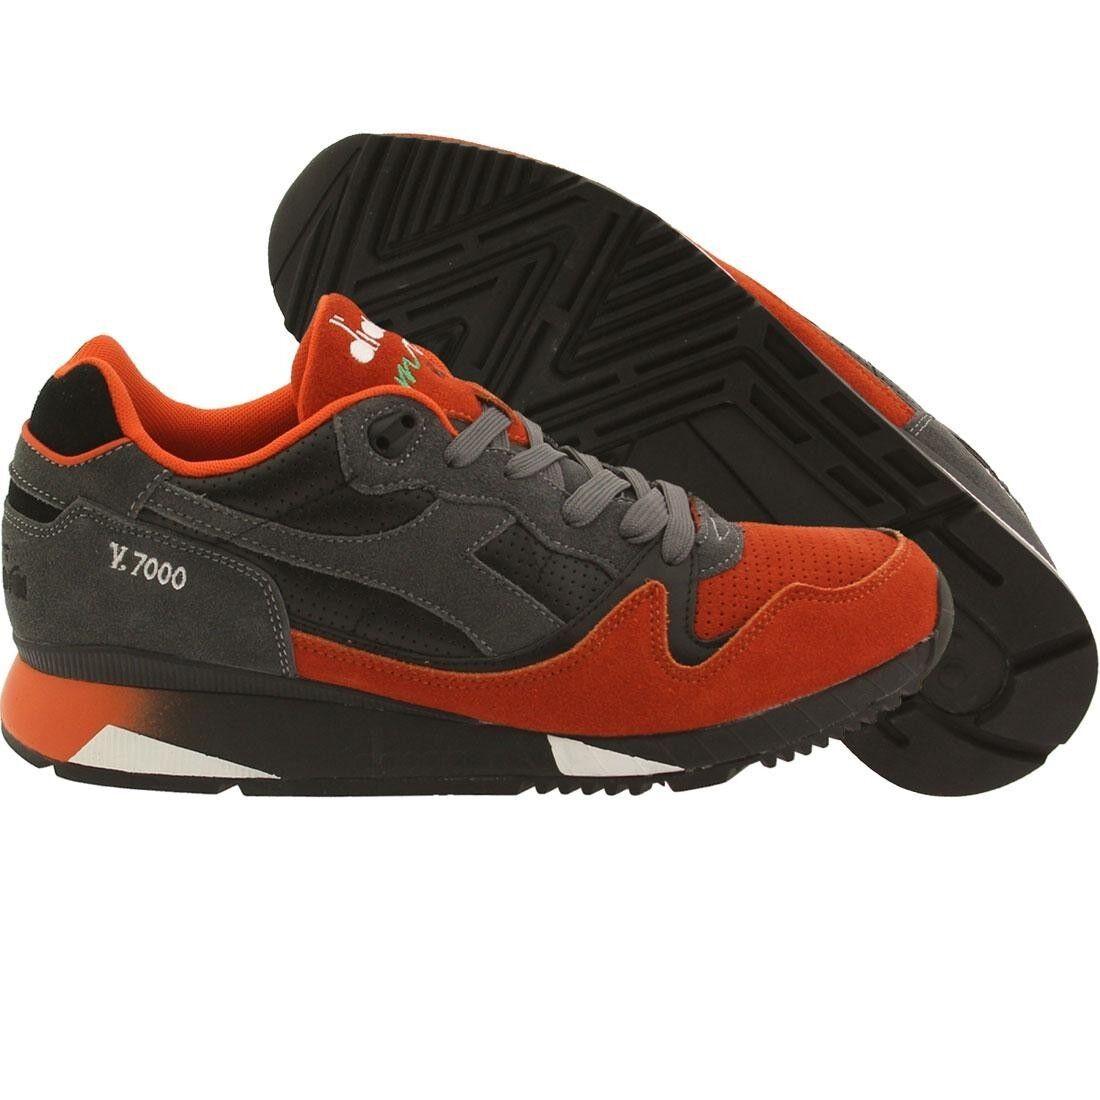 Diadora Men V7000 black orange castlerock 161998C5875